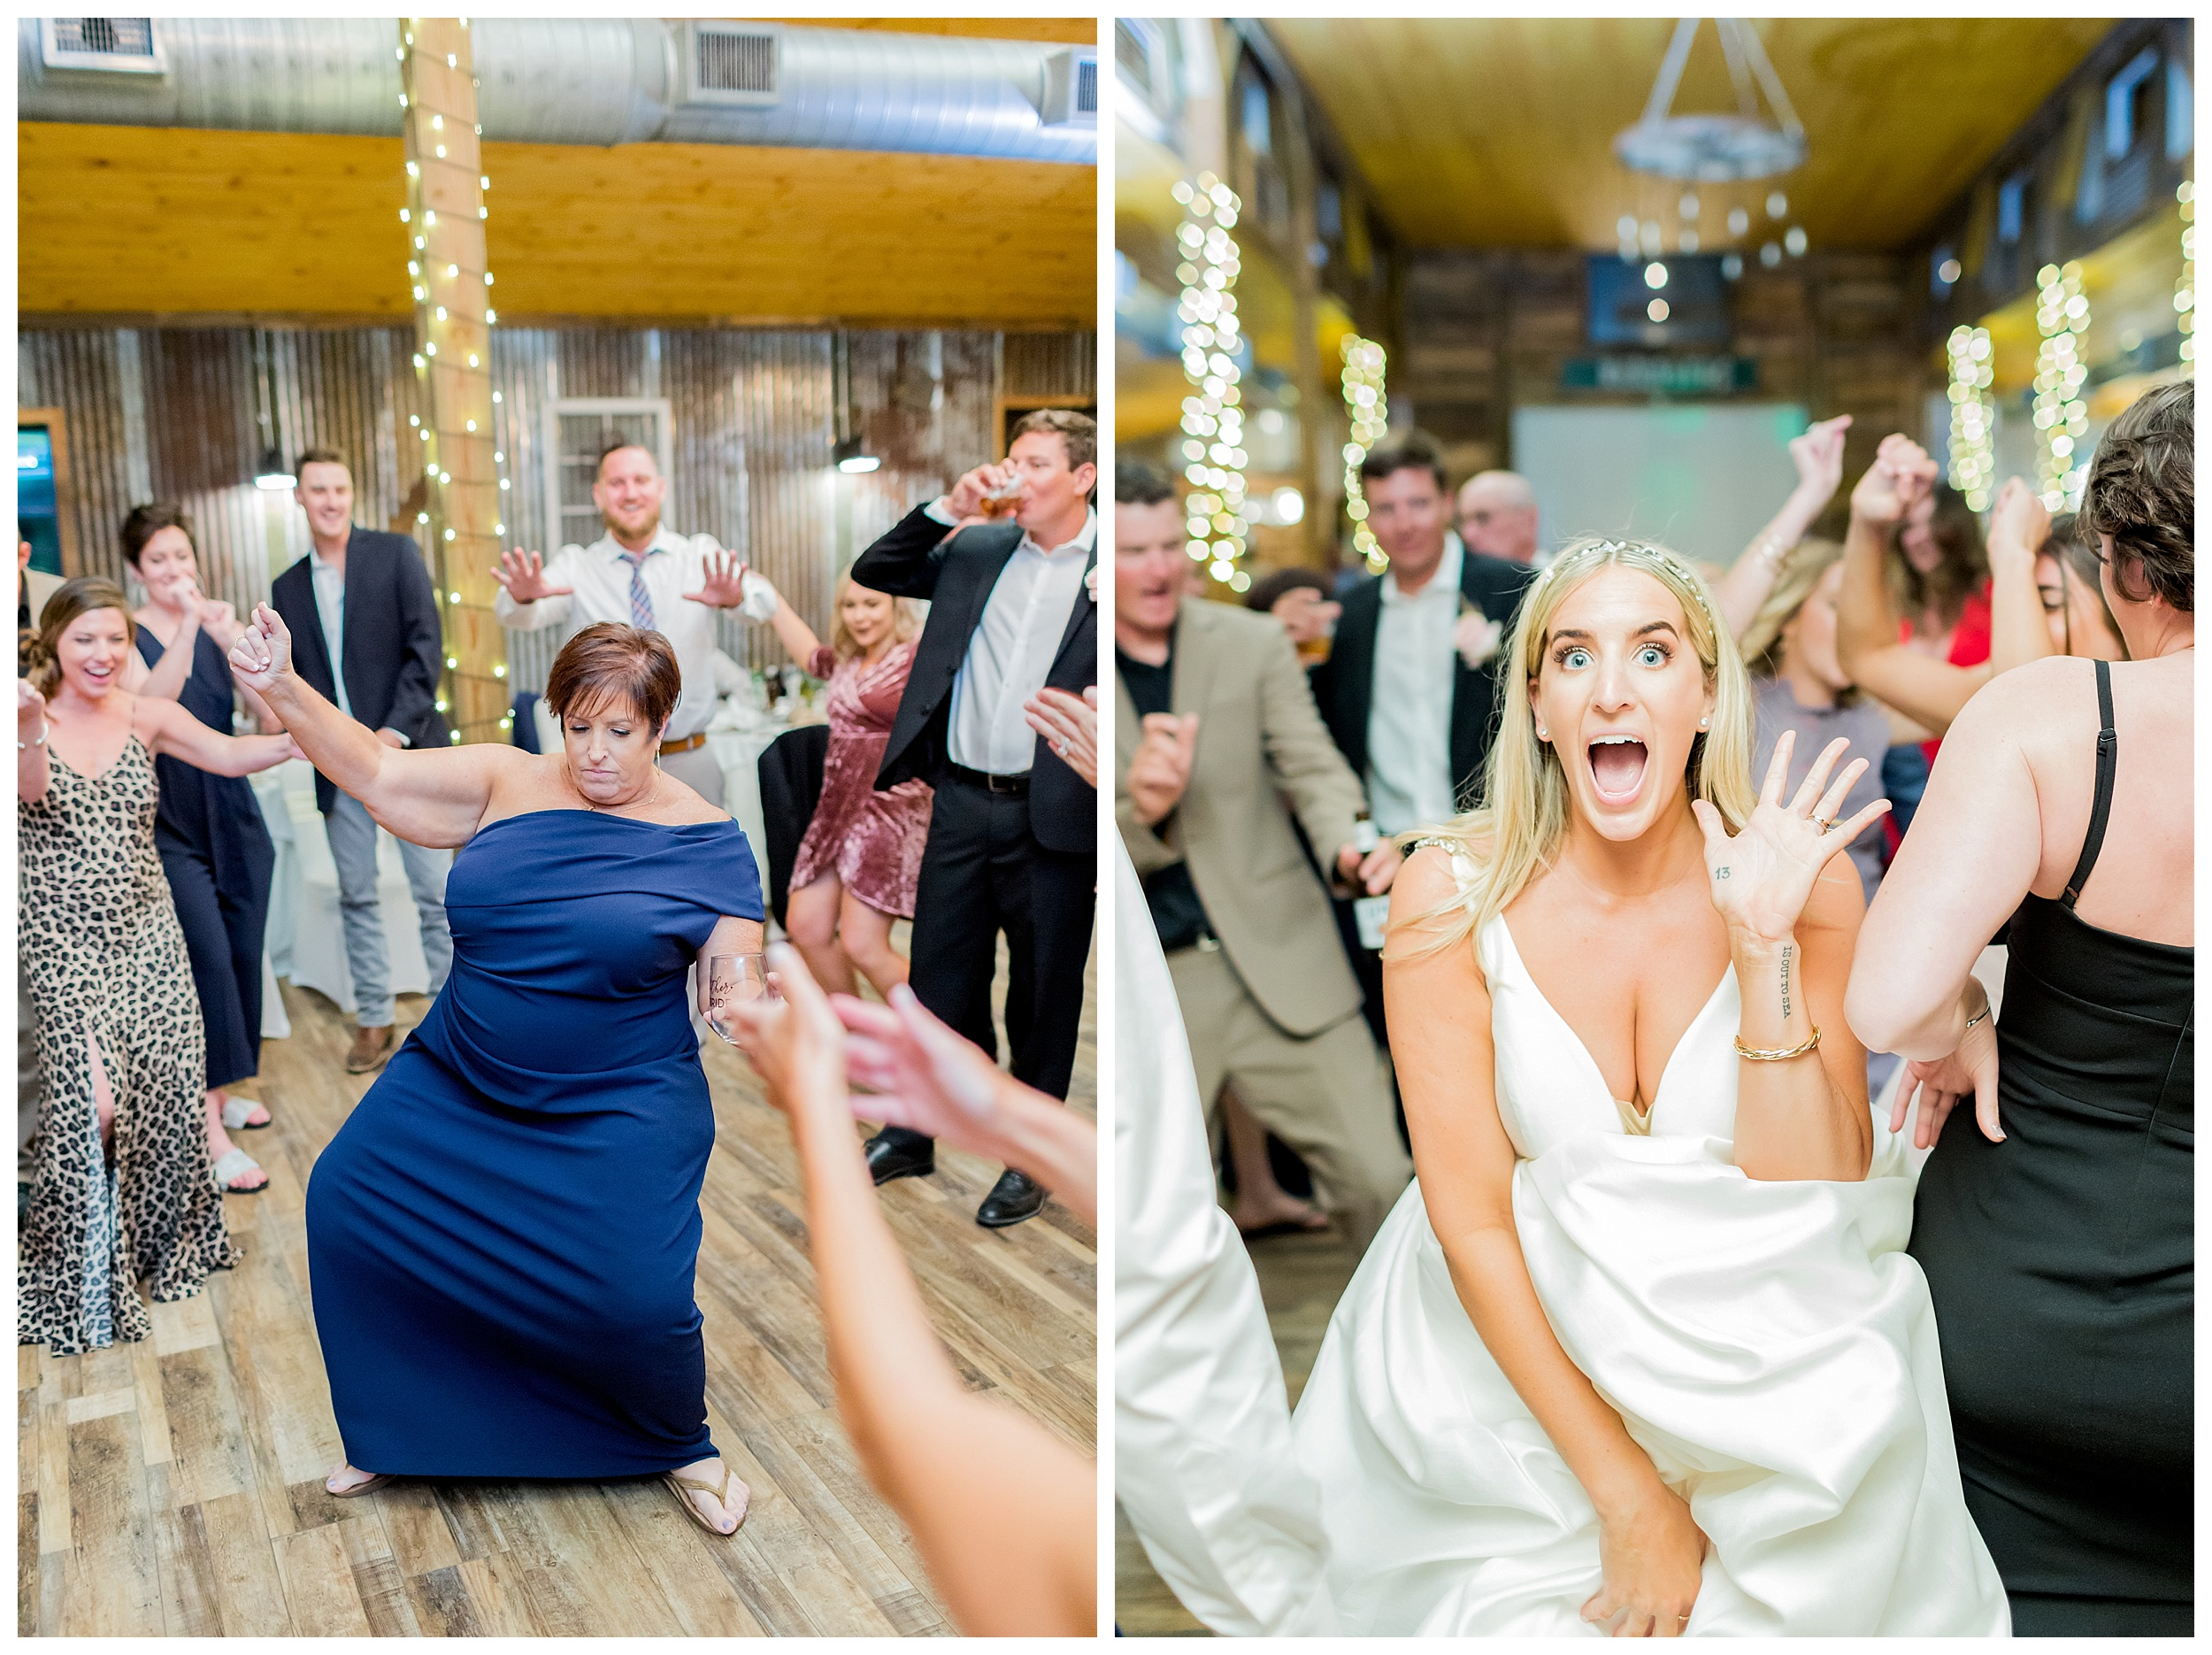 South Florida Wedding Photographer Kir Tuben_0111.jpg